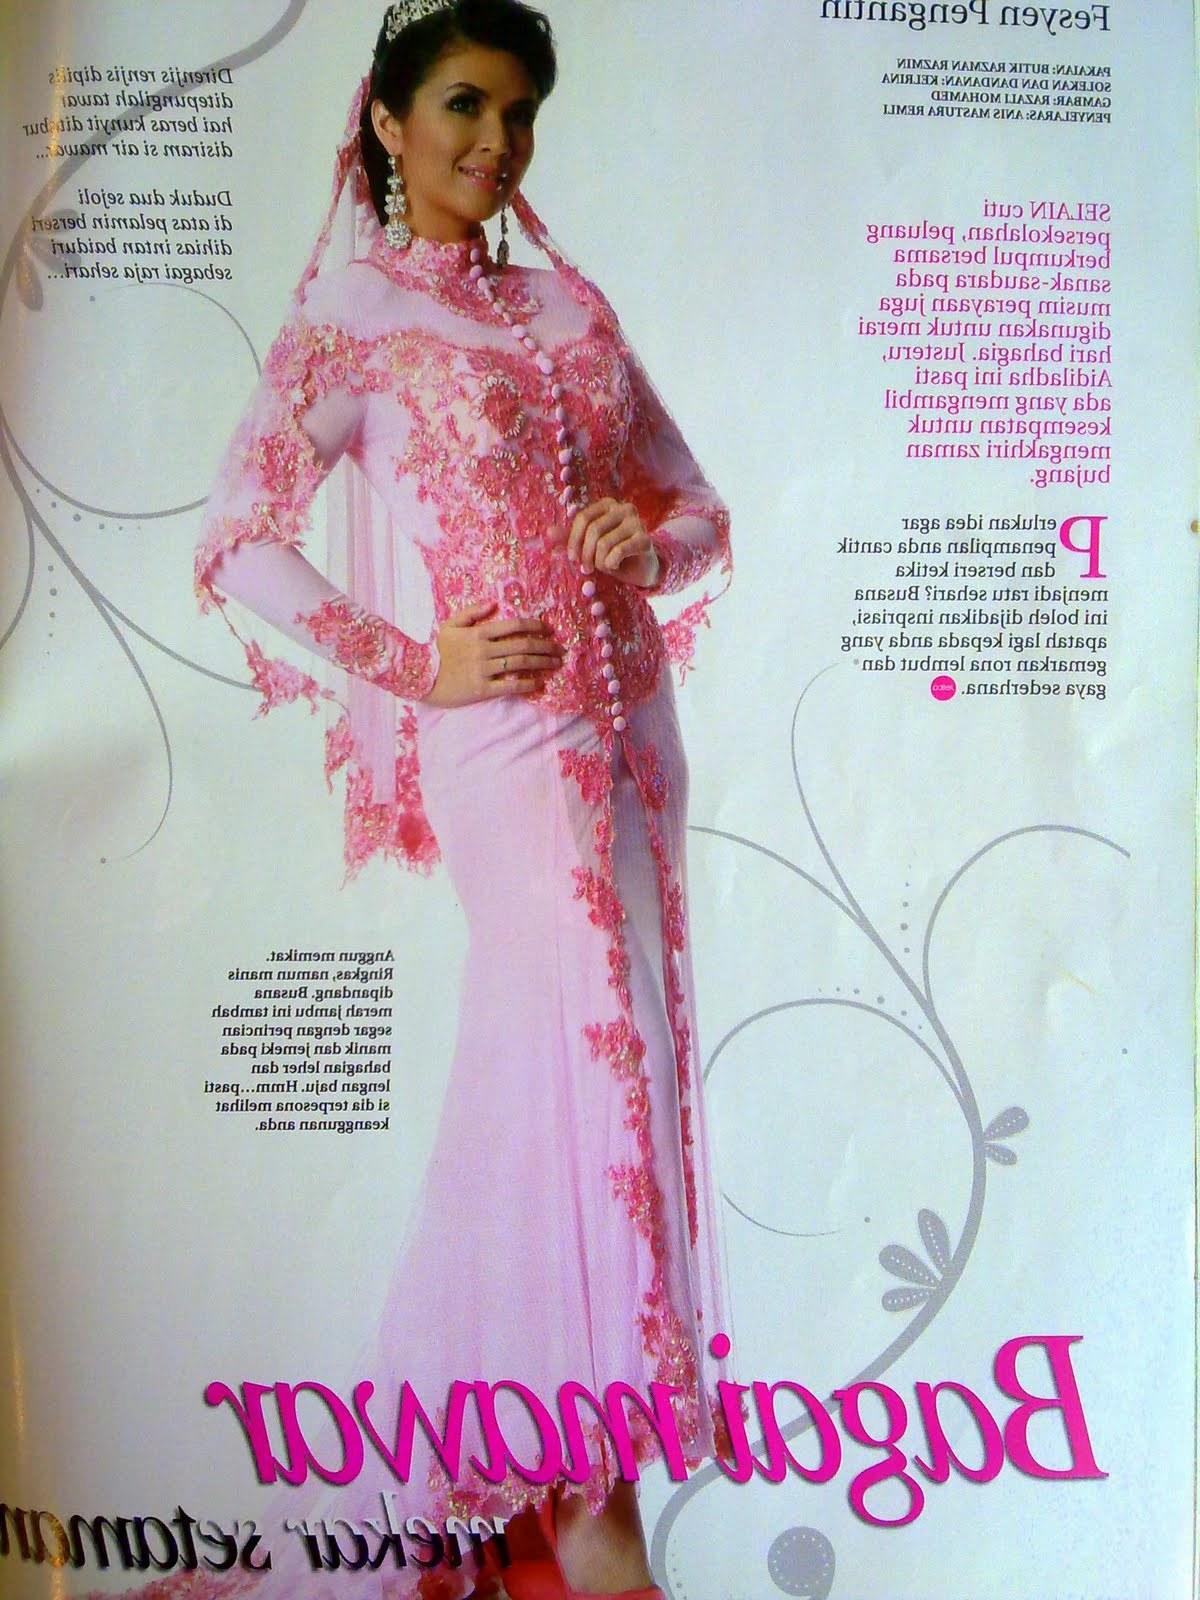 Ide Baju Pengantin Muslimah 2016 Nkde Wynn Nasution 2010